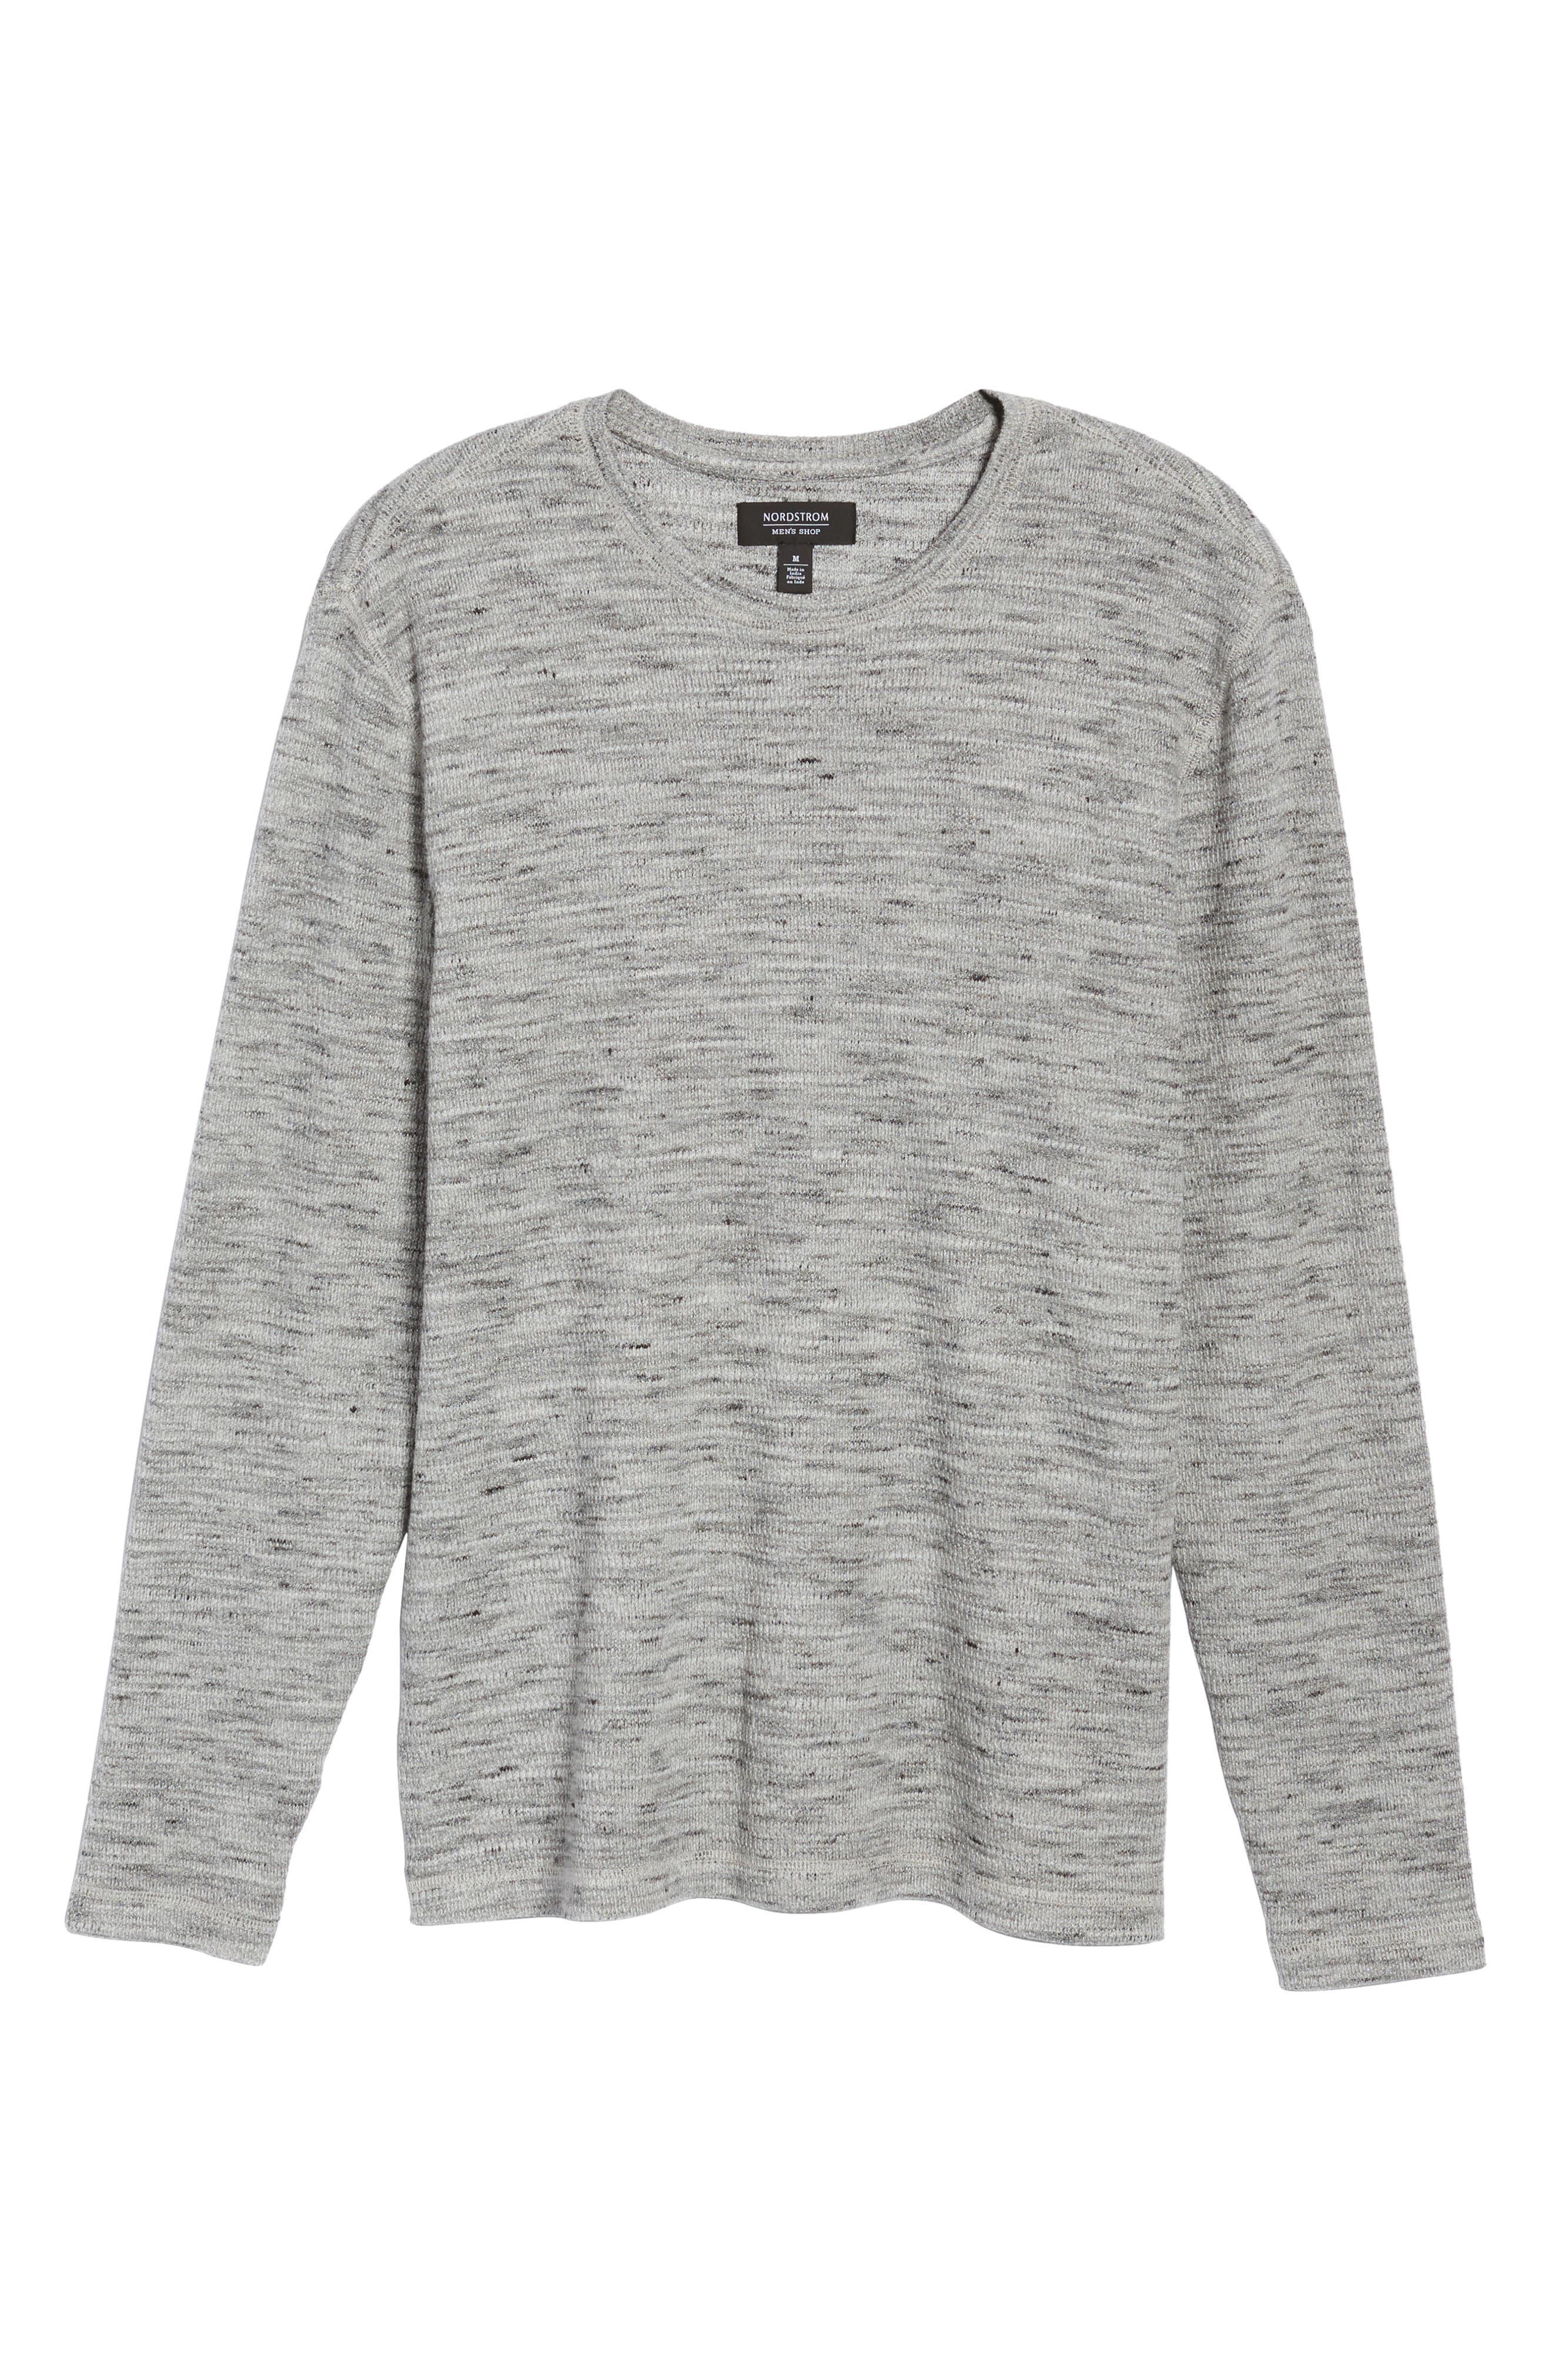 Waffle Knit Shirt,                             Alternate thumbnail 6, color,                             Grey Sleet Melange